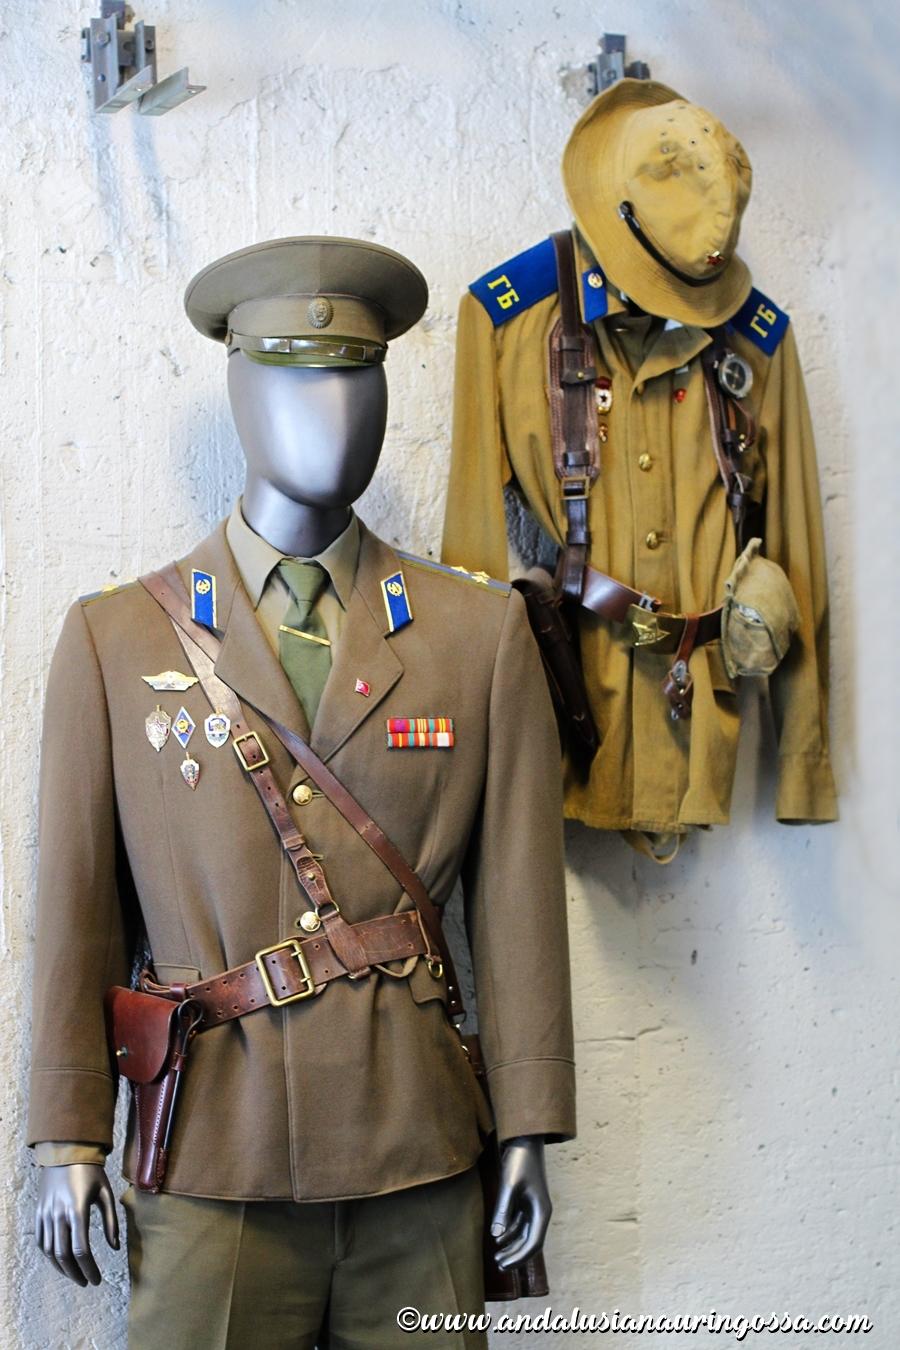 Viru-hotelli_KGB-museo_Tallinna_Andalusian auringossa_ruokablogi_matkablogi_15